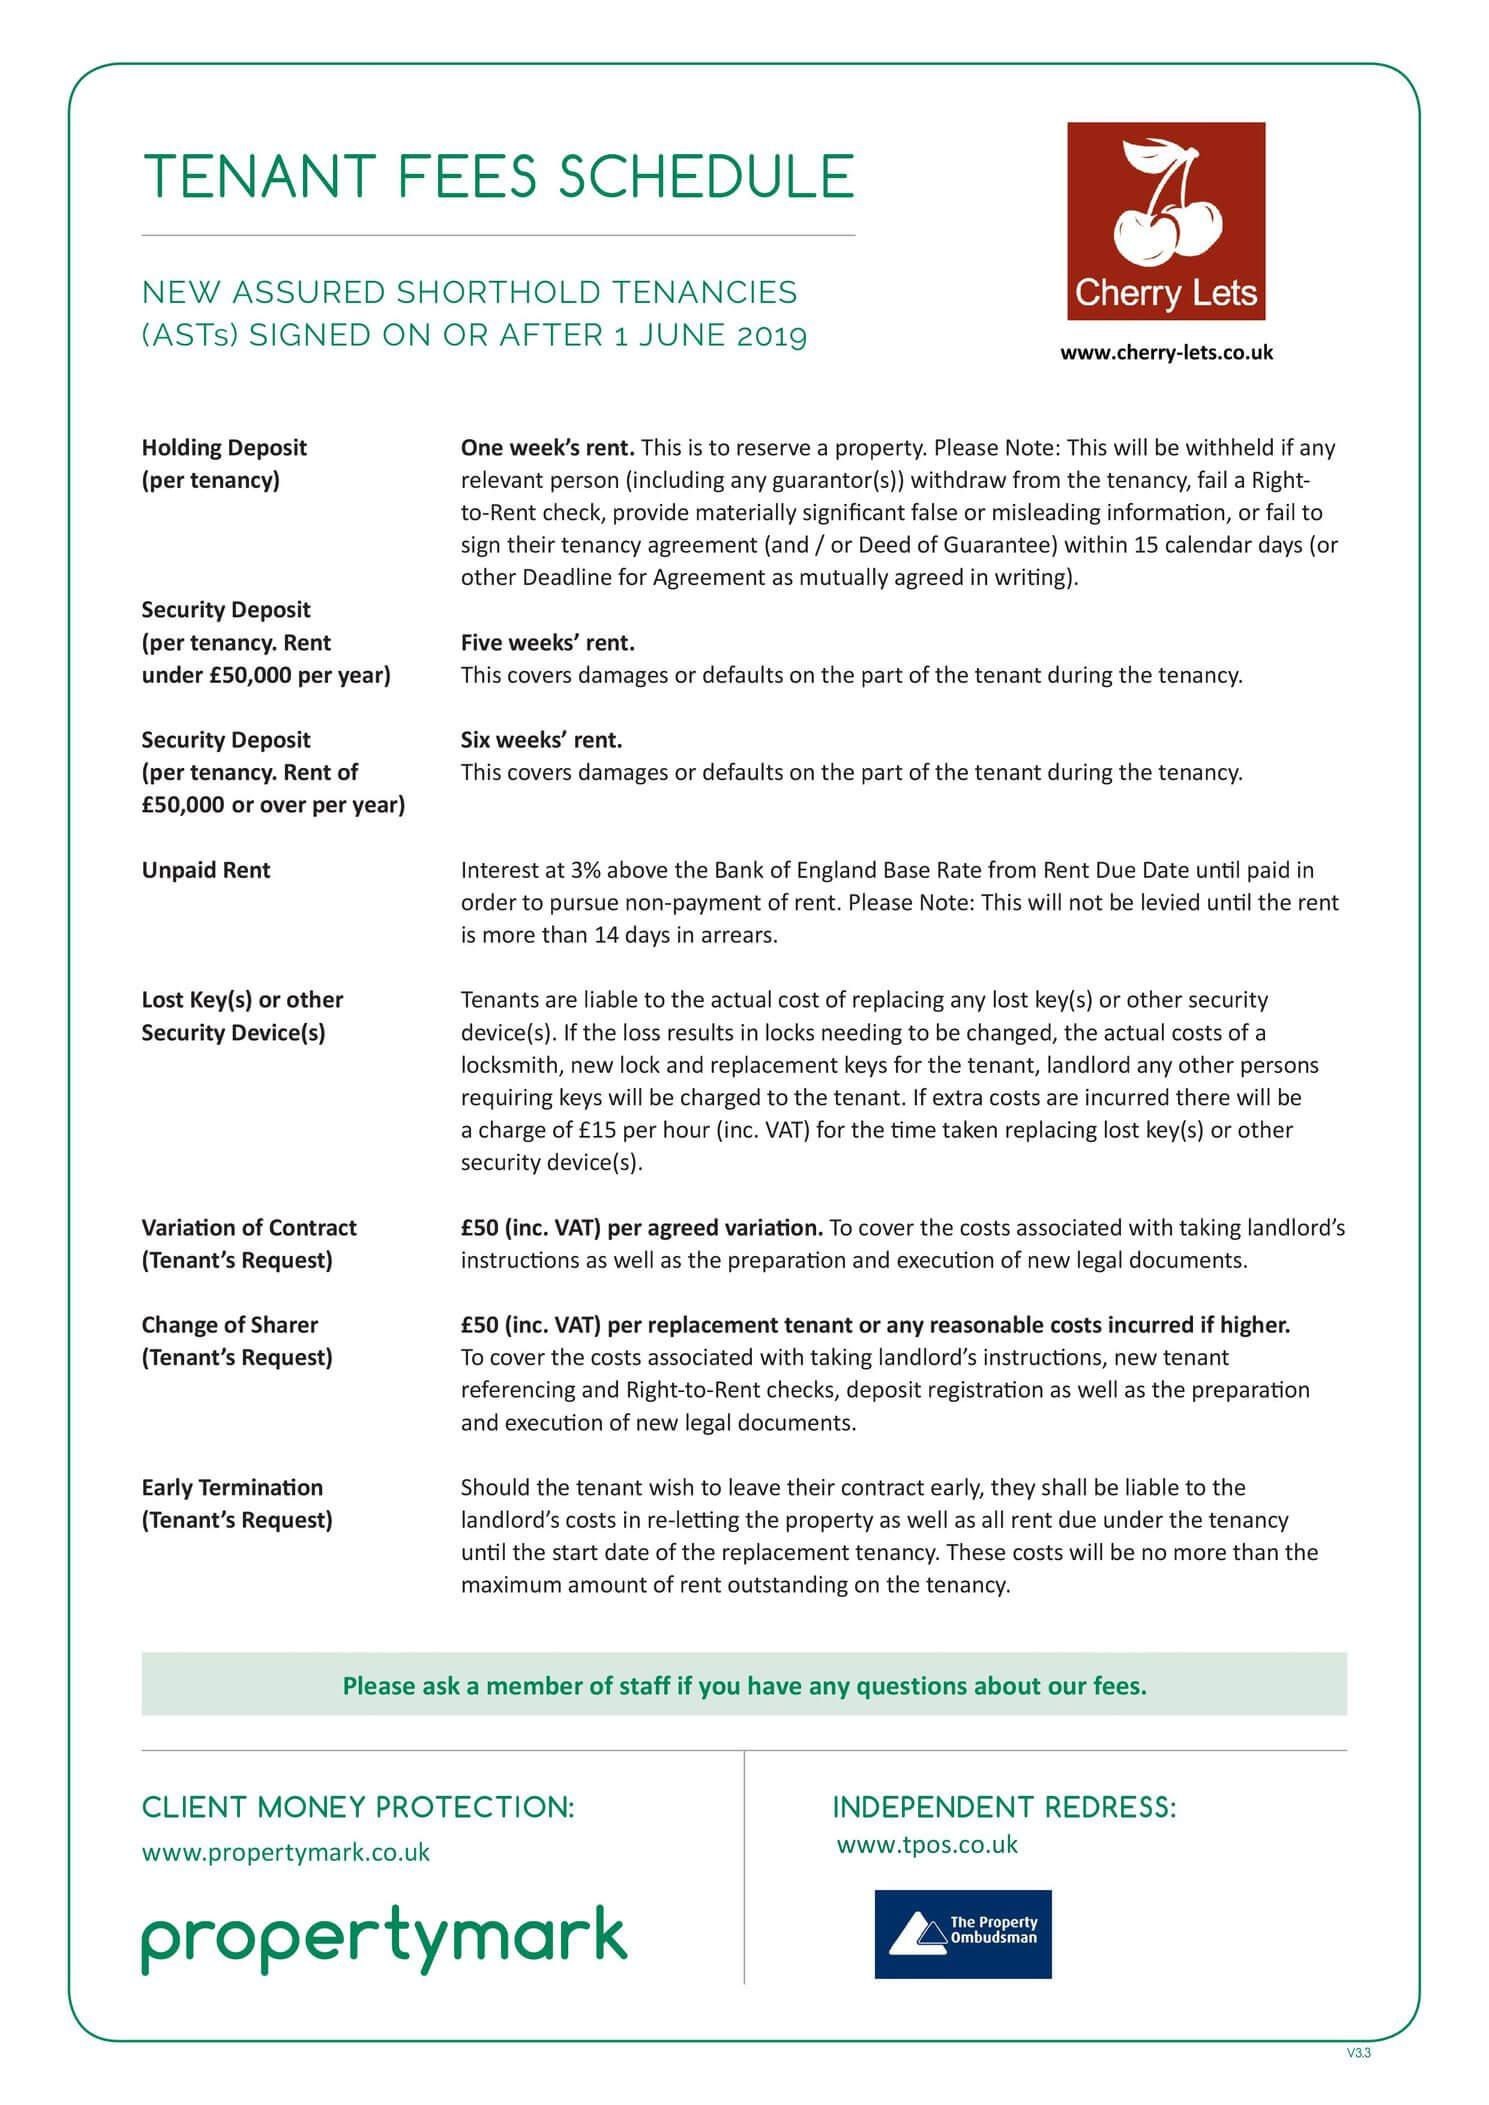 Cherry Lets - ARLA Propertymark Tenant Fees Schedule